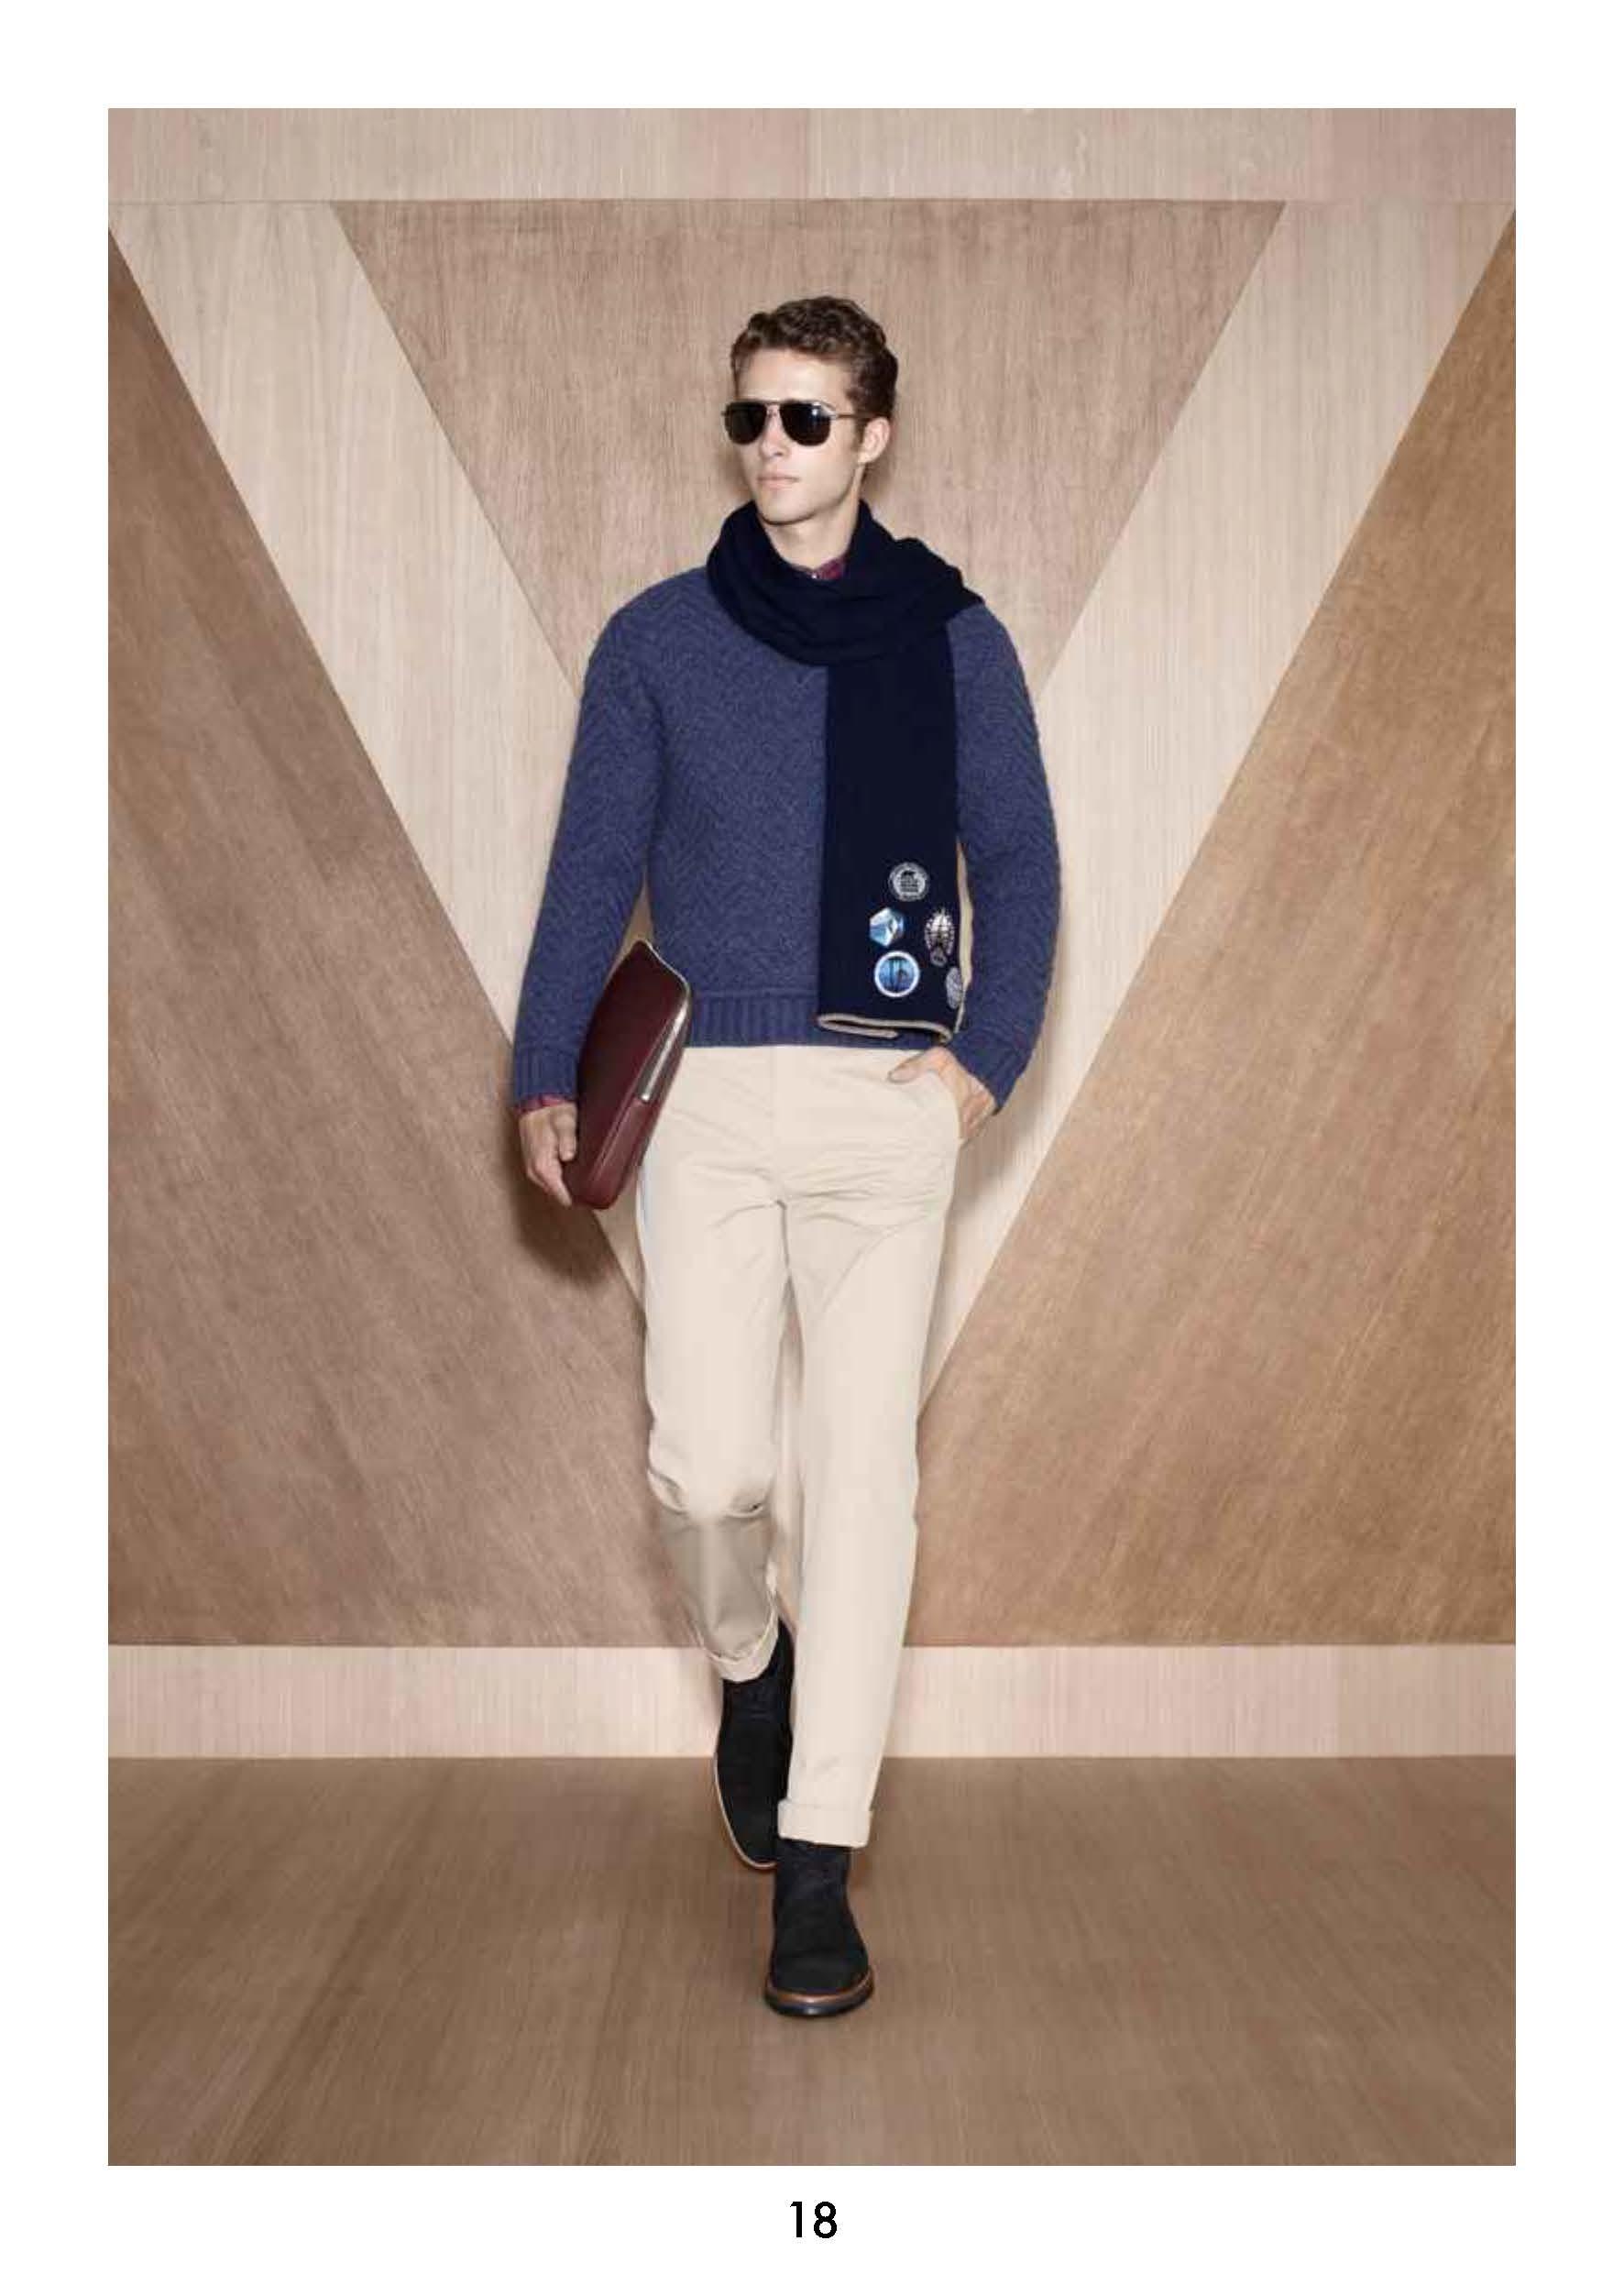 Alexander Johansson & Ryan Taylor for Louis Vuitton Pre Fall 2012  image